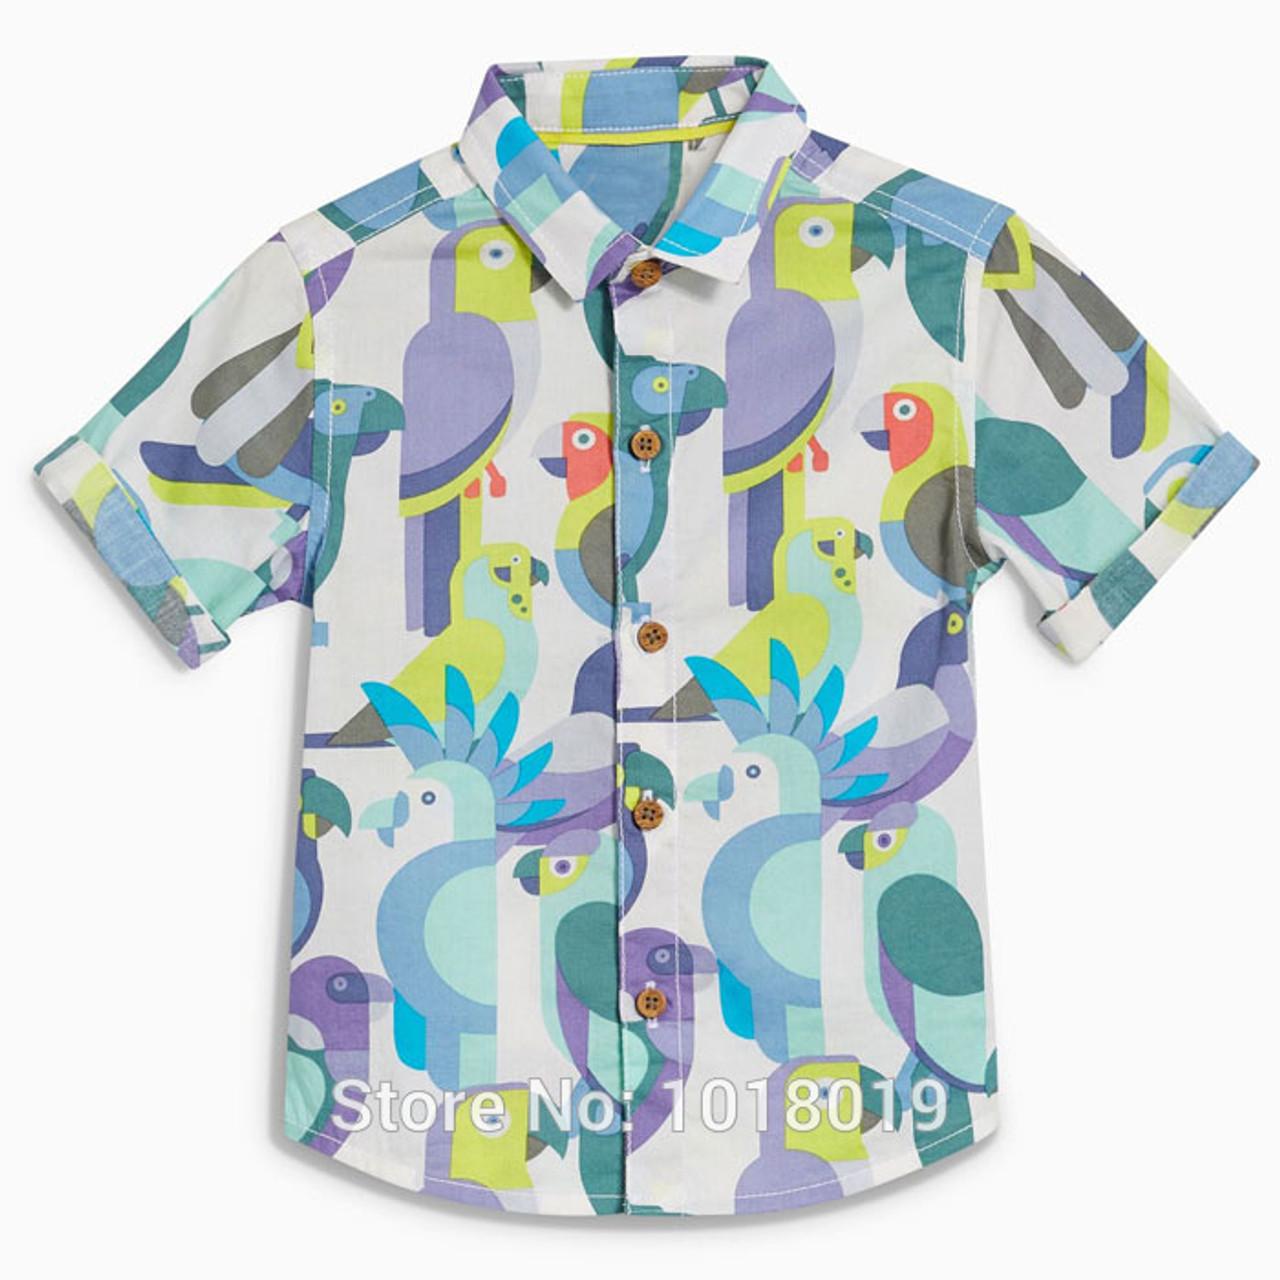 Summer Toddler Kids Baby Boy Short Sleeve T-Shirt Tee Tops Casual Blouse 1-7T